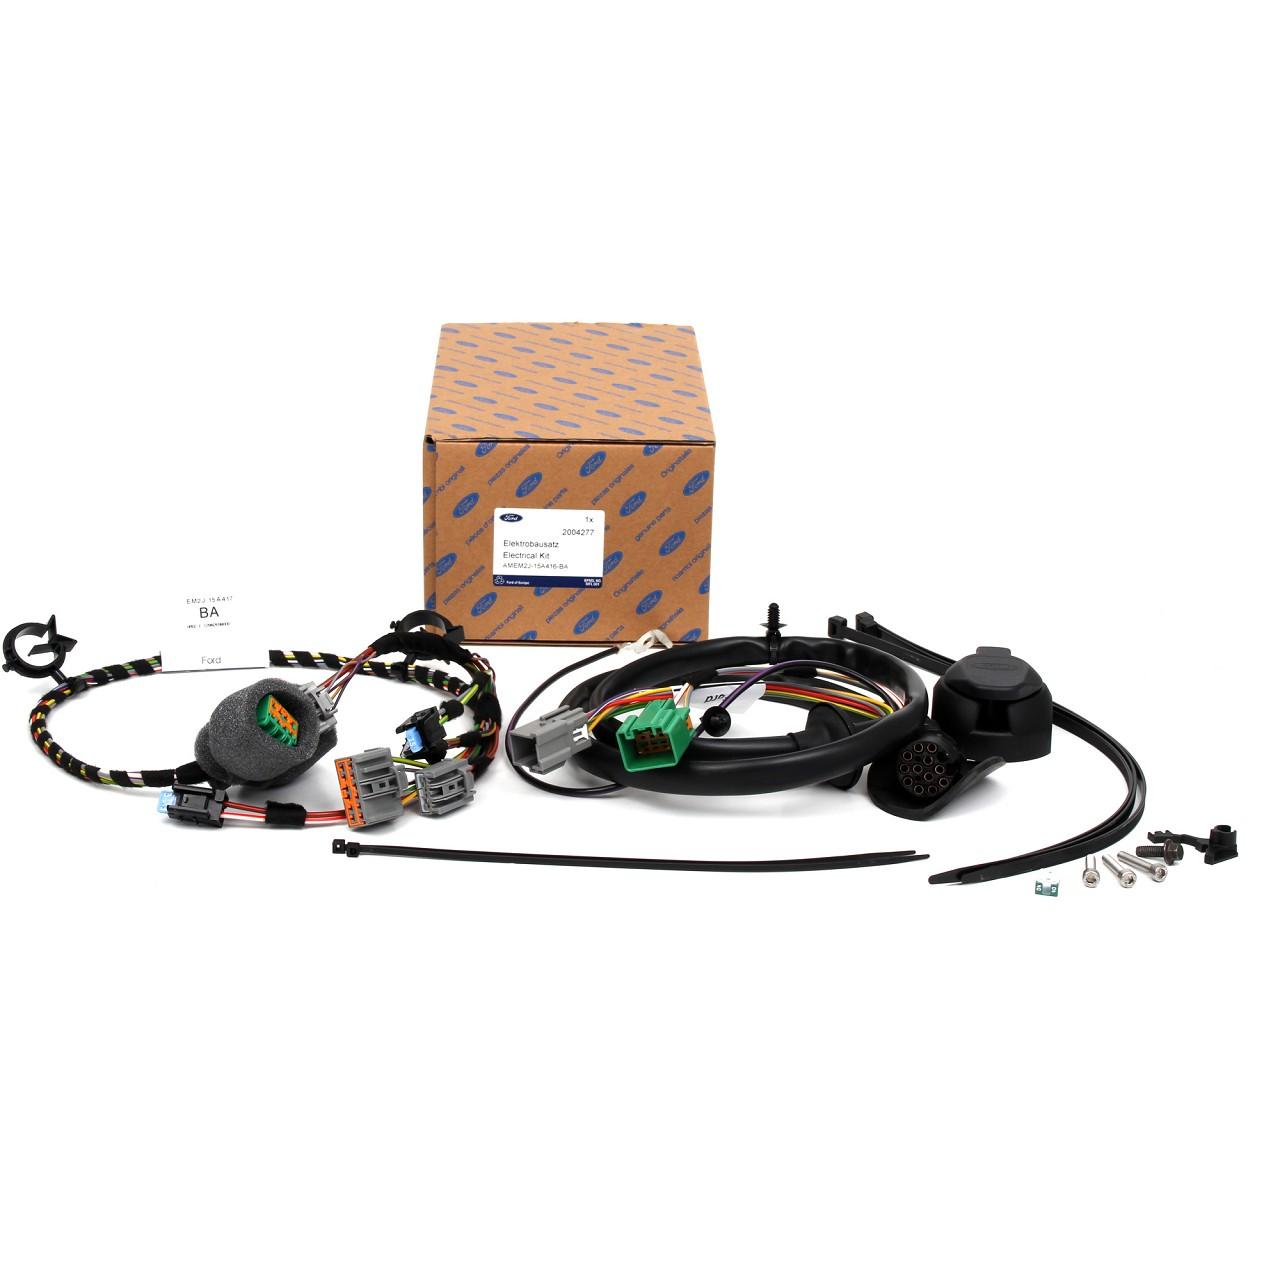 ORIGINAL Ford E-Satz Kabelsatz Anhängerkupplung GALAXY 2.0TDCI 4x4 2004277